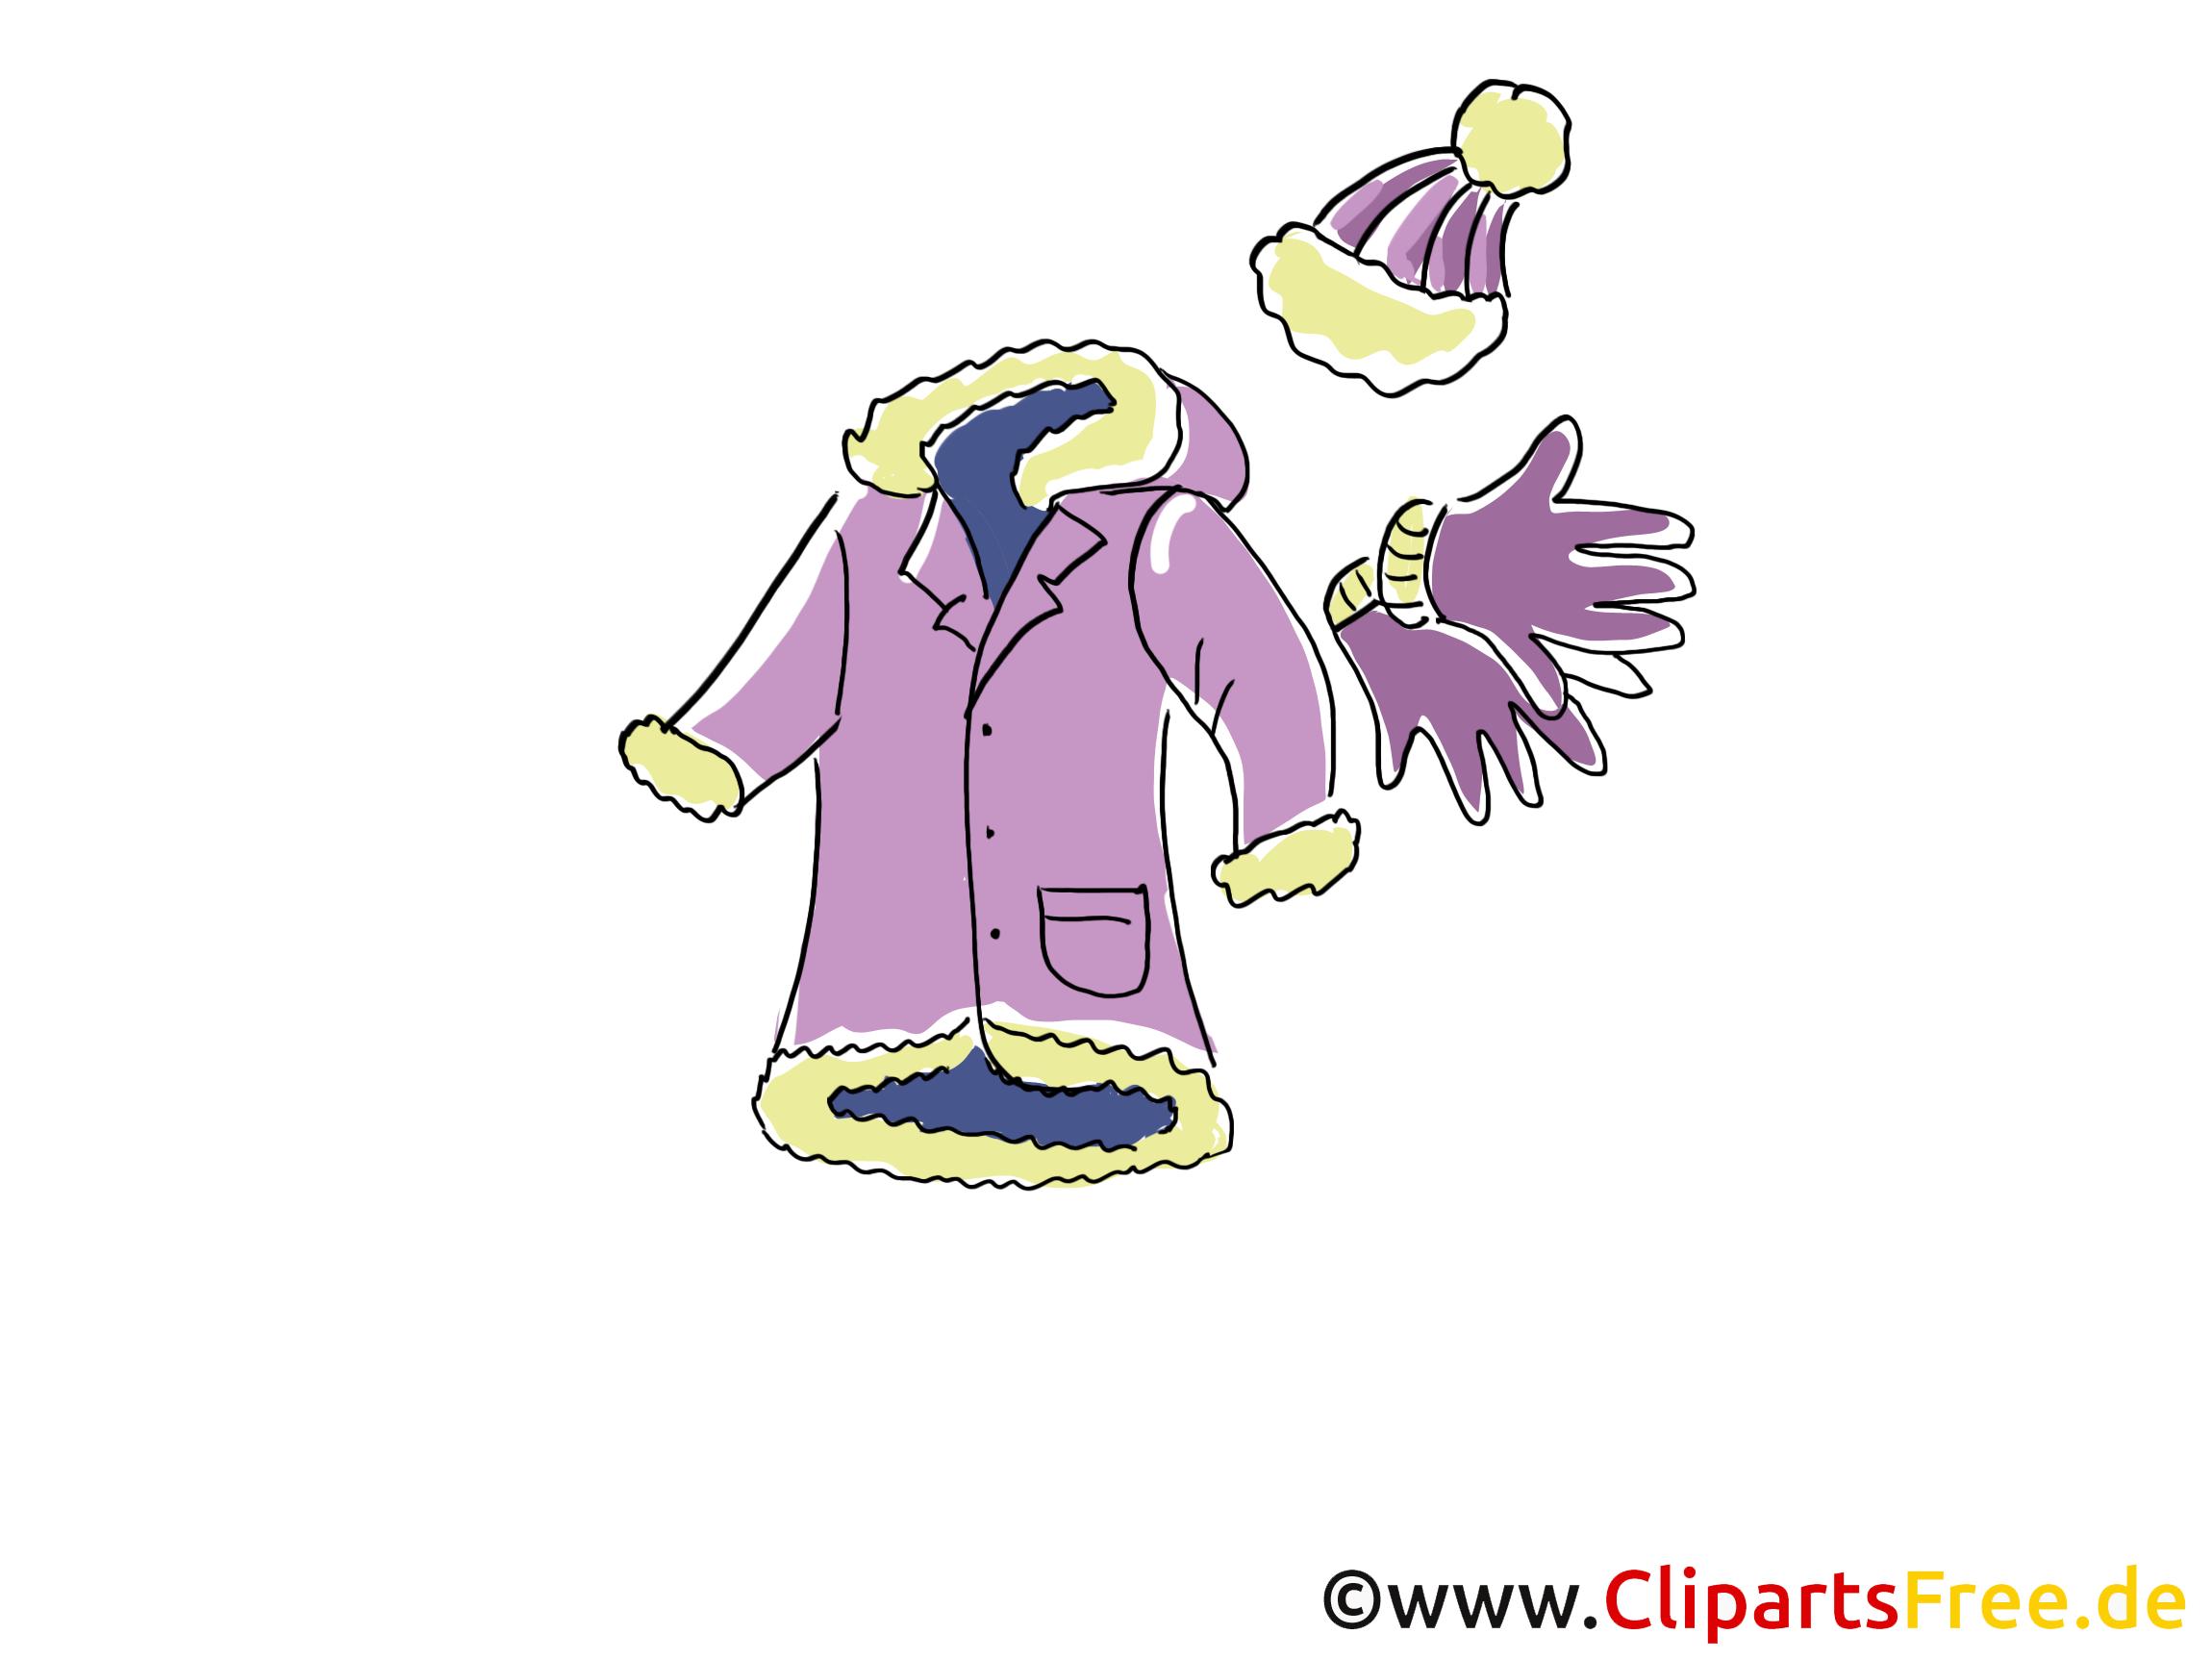 Winterkleidung Clipart, Bild, Illustration, Grafik,  Image kostenlos